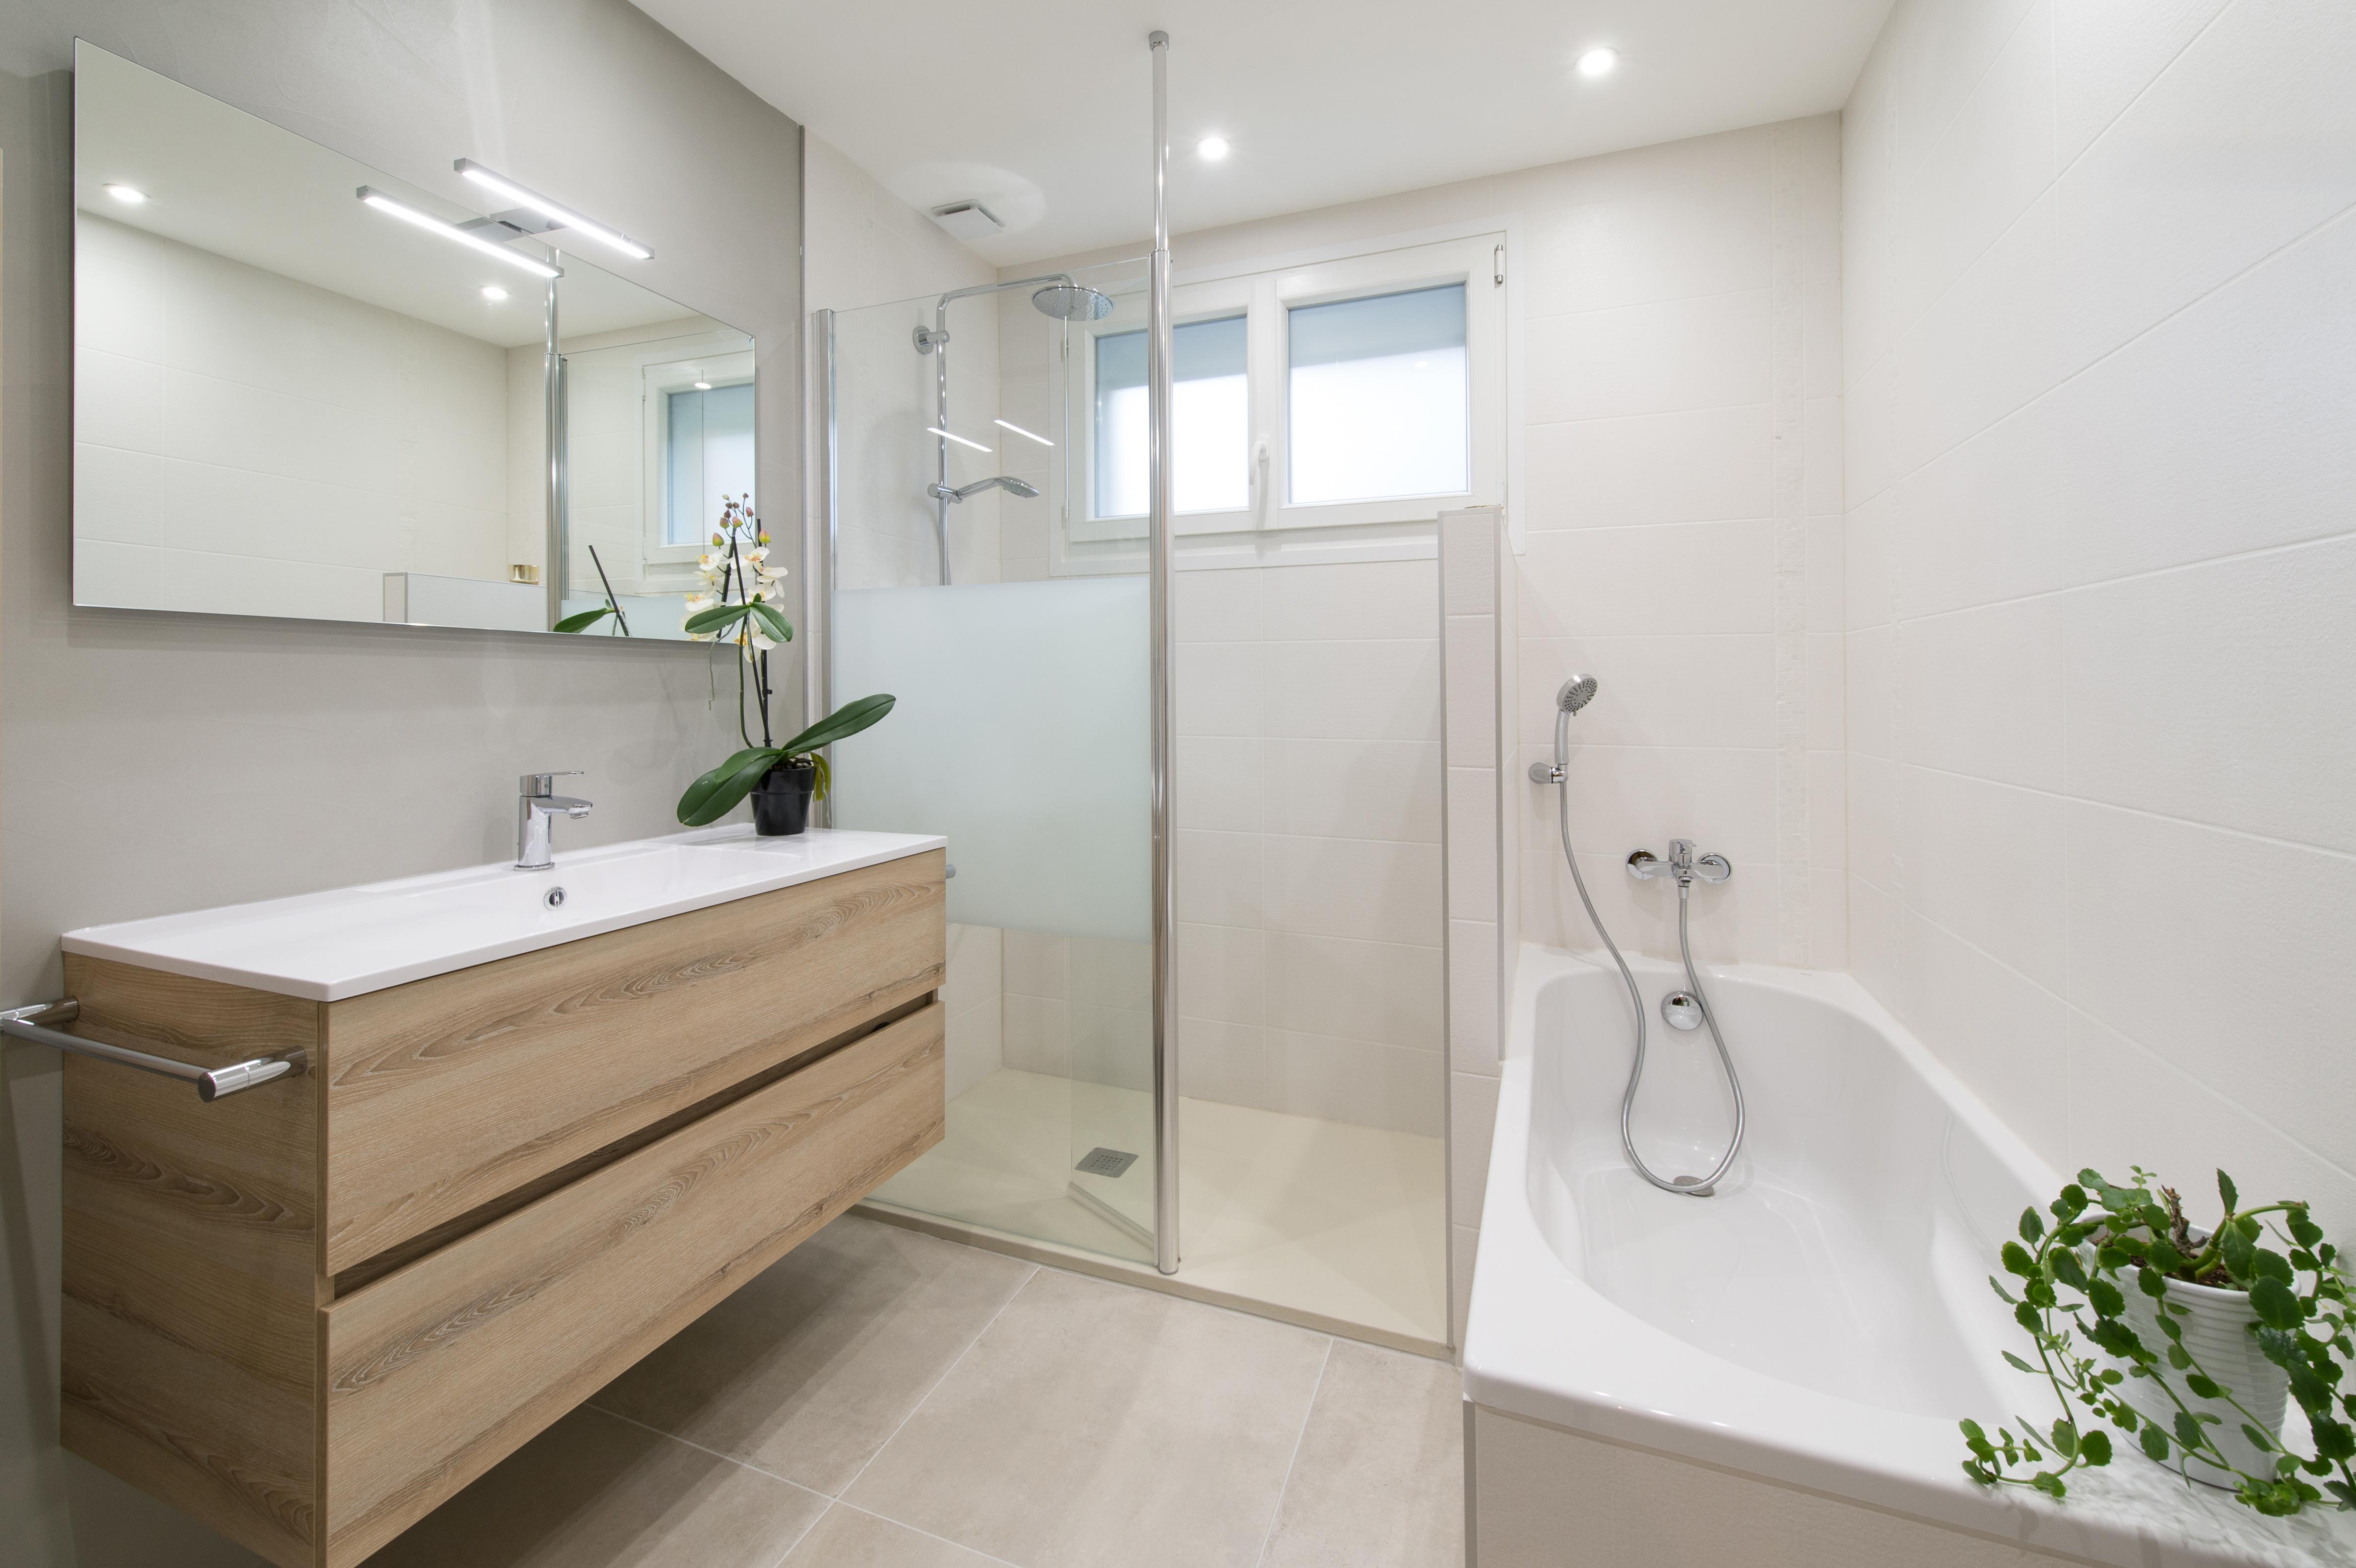 Salle de bains douche et baignoire for Salle bain baignoire